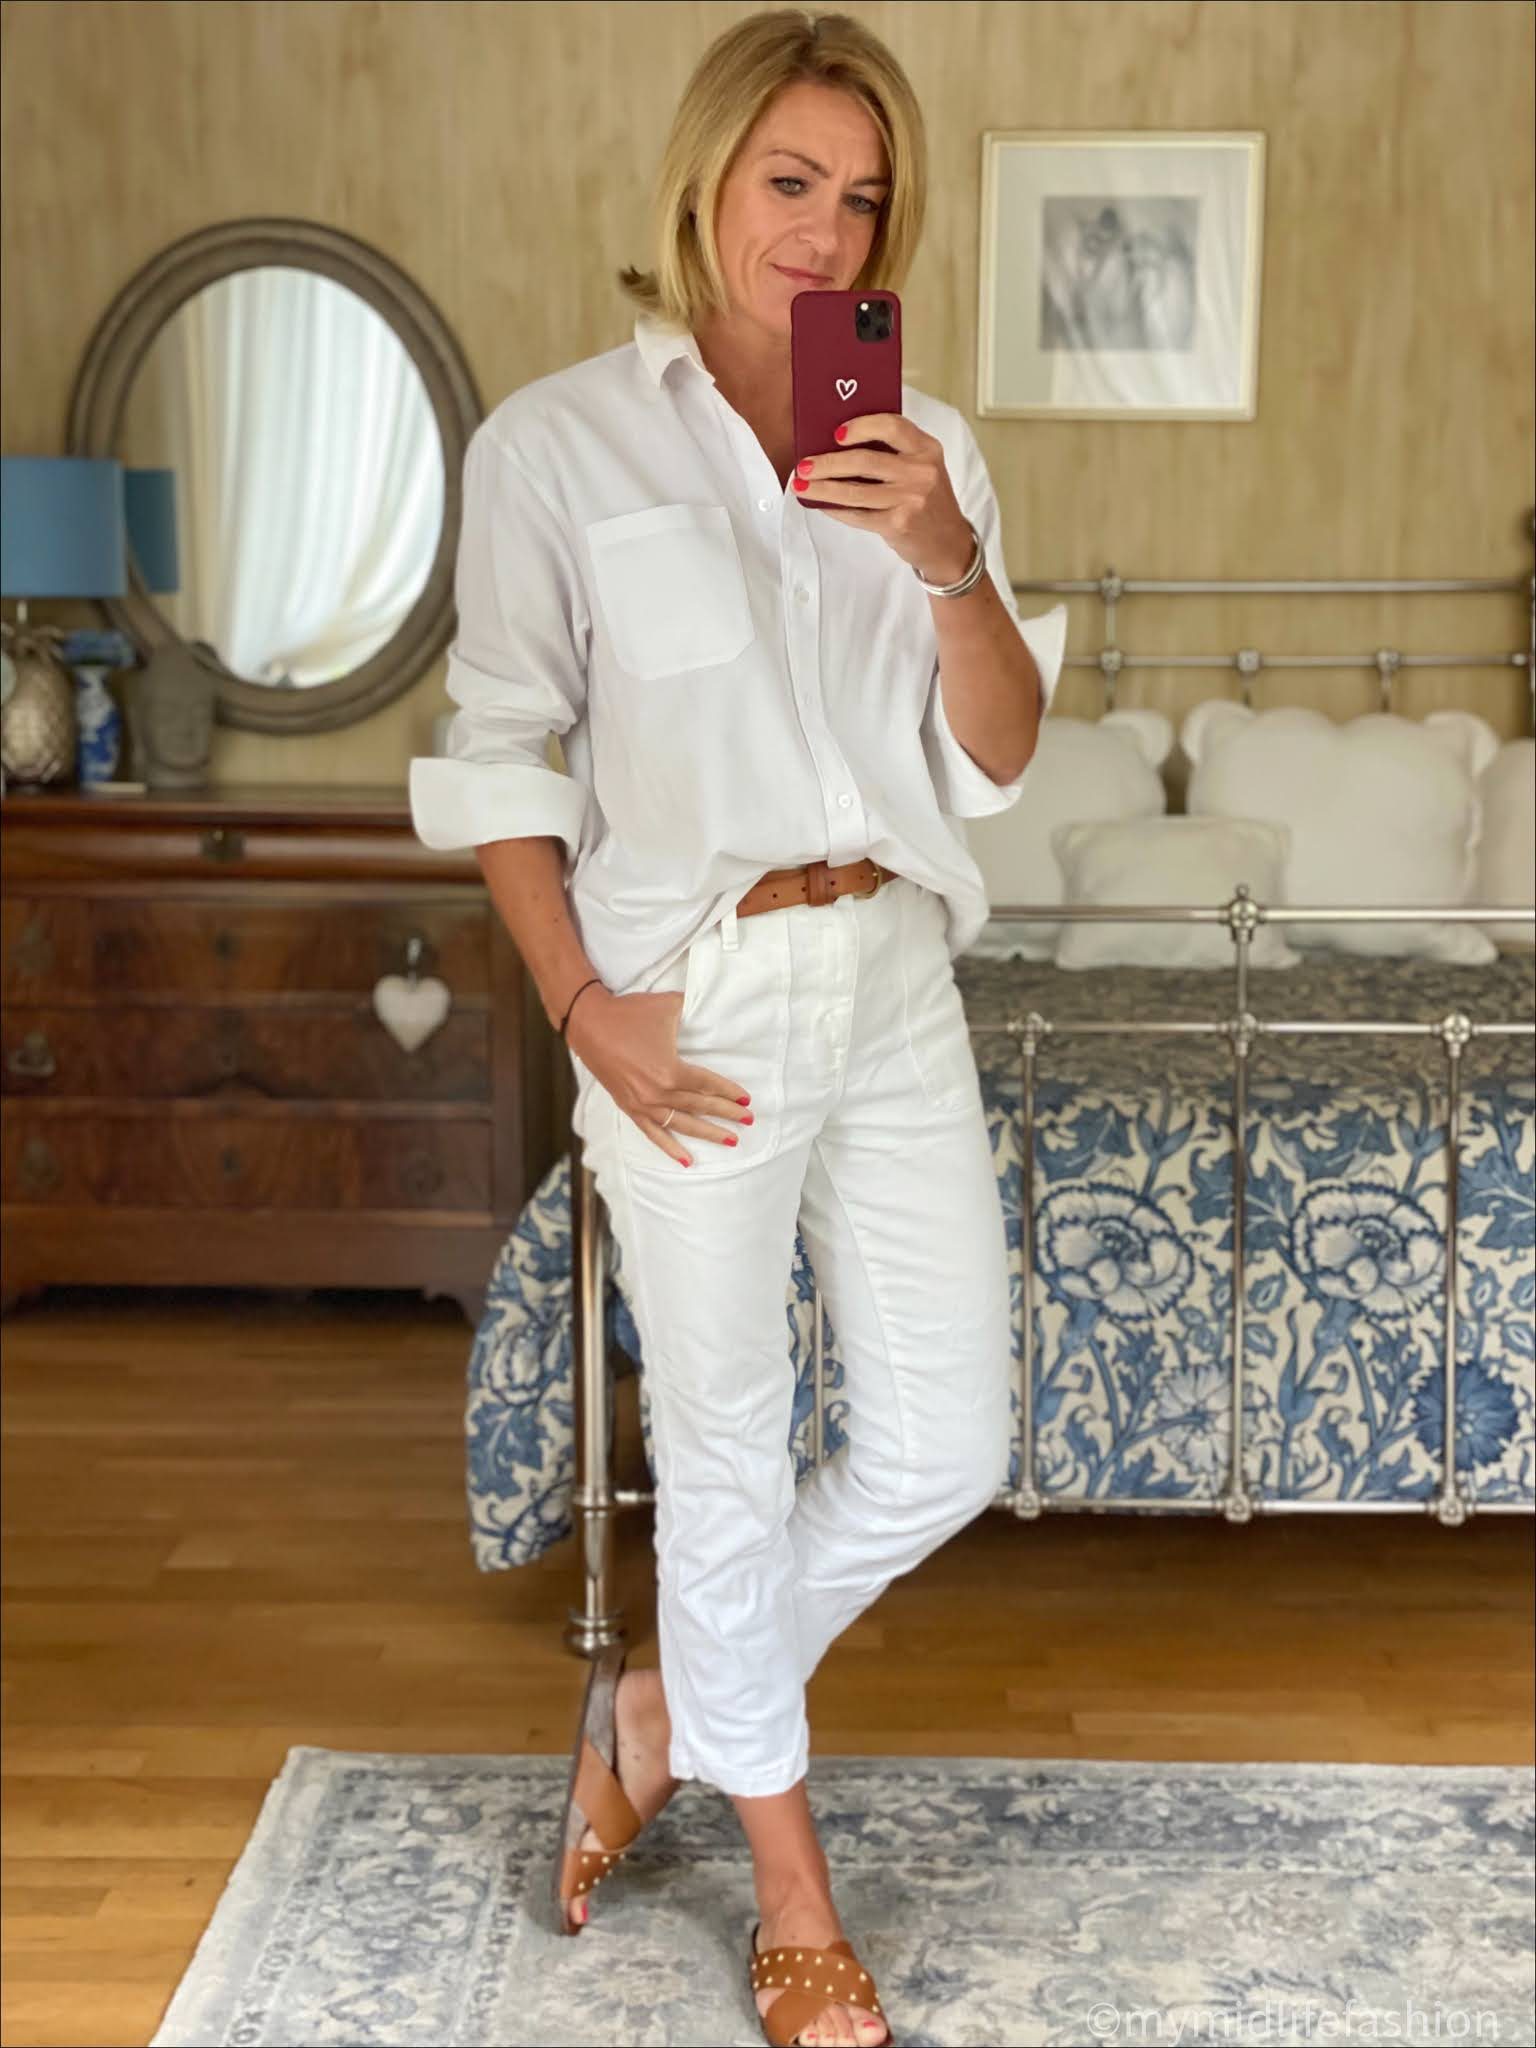 my midlife fashion, an other stories boyfriend shirt, Massimo Dutti leather belt, j crew cropped kick flare jeans, basalt studded slides